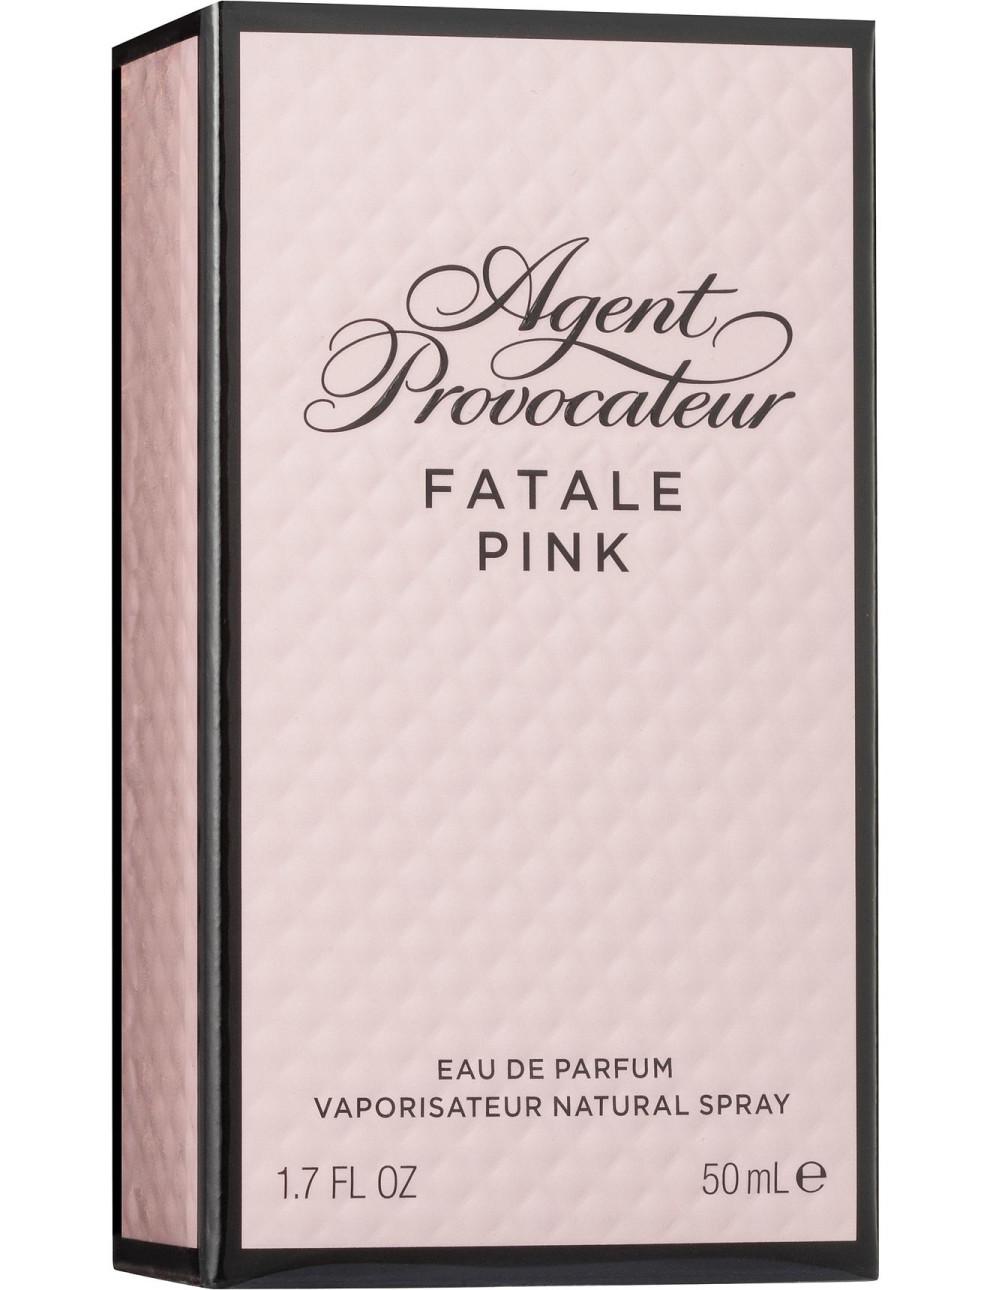 7c07afe2e7f0d Ляромат: Agent Provocateur Fatale Pink - Туалетная вода (духи) Агент ...